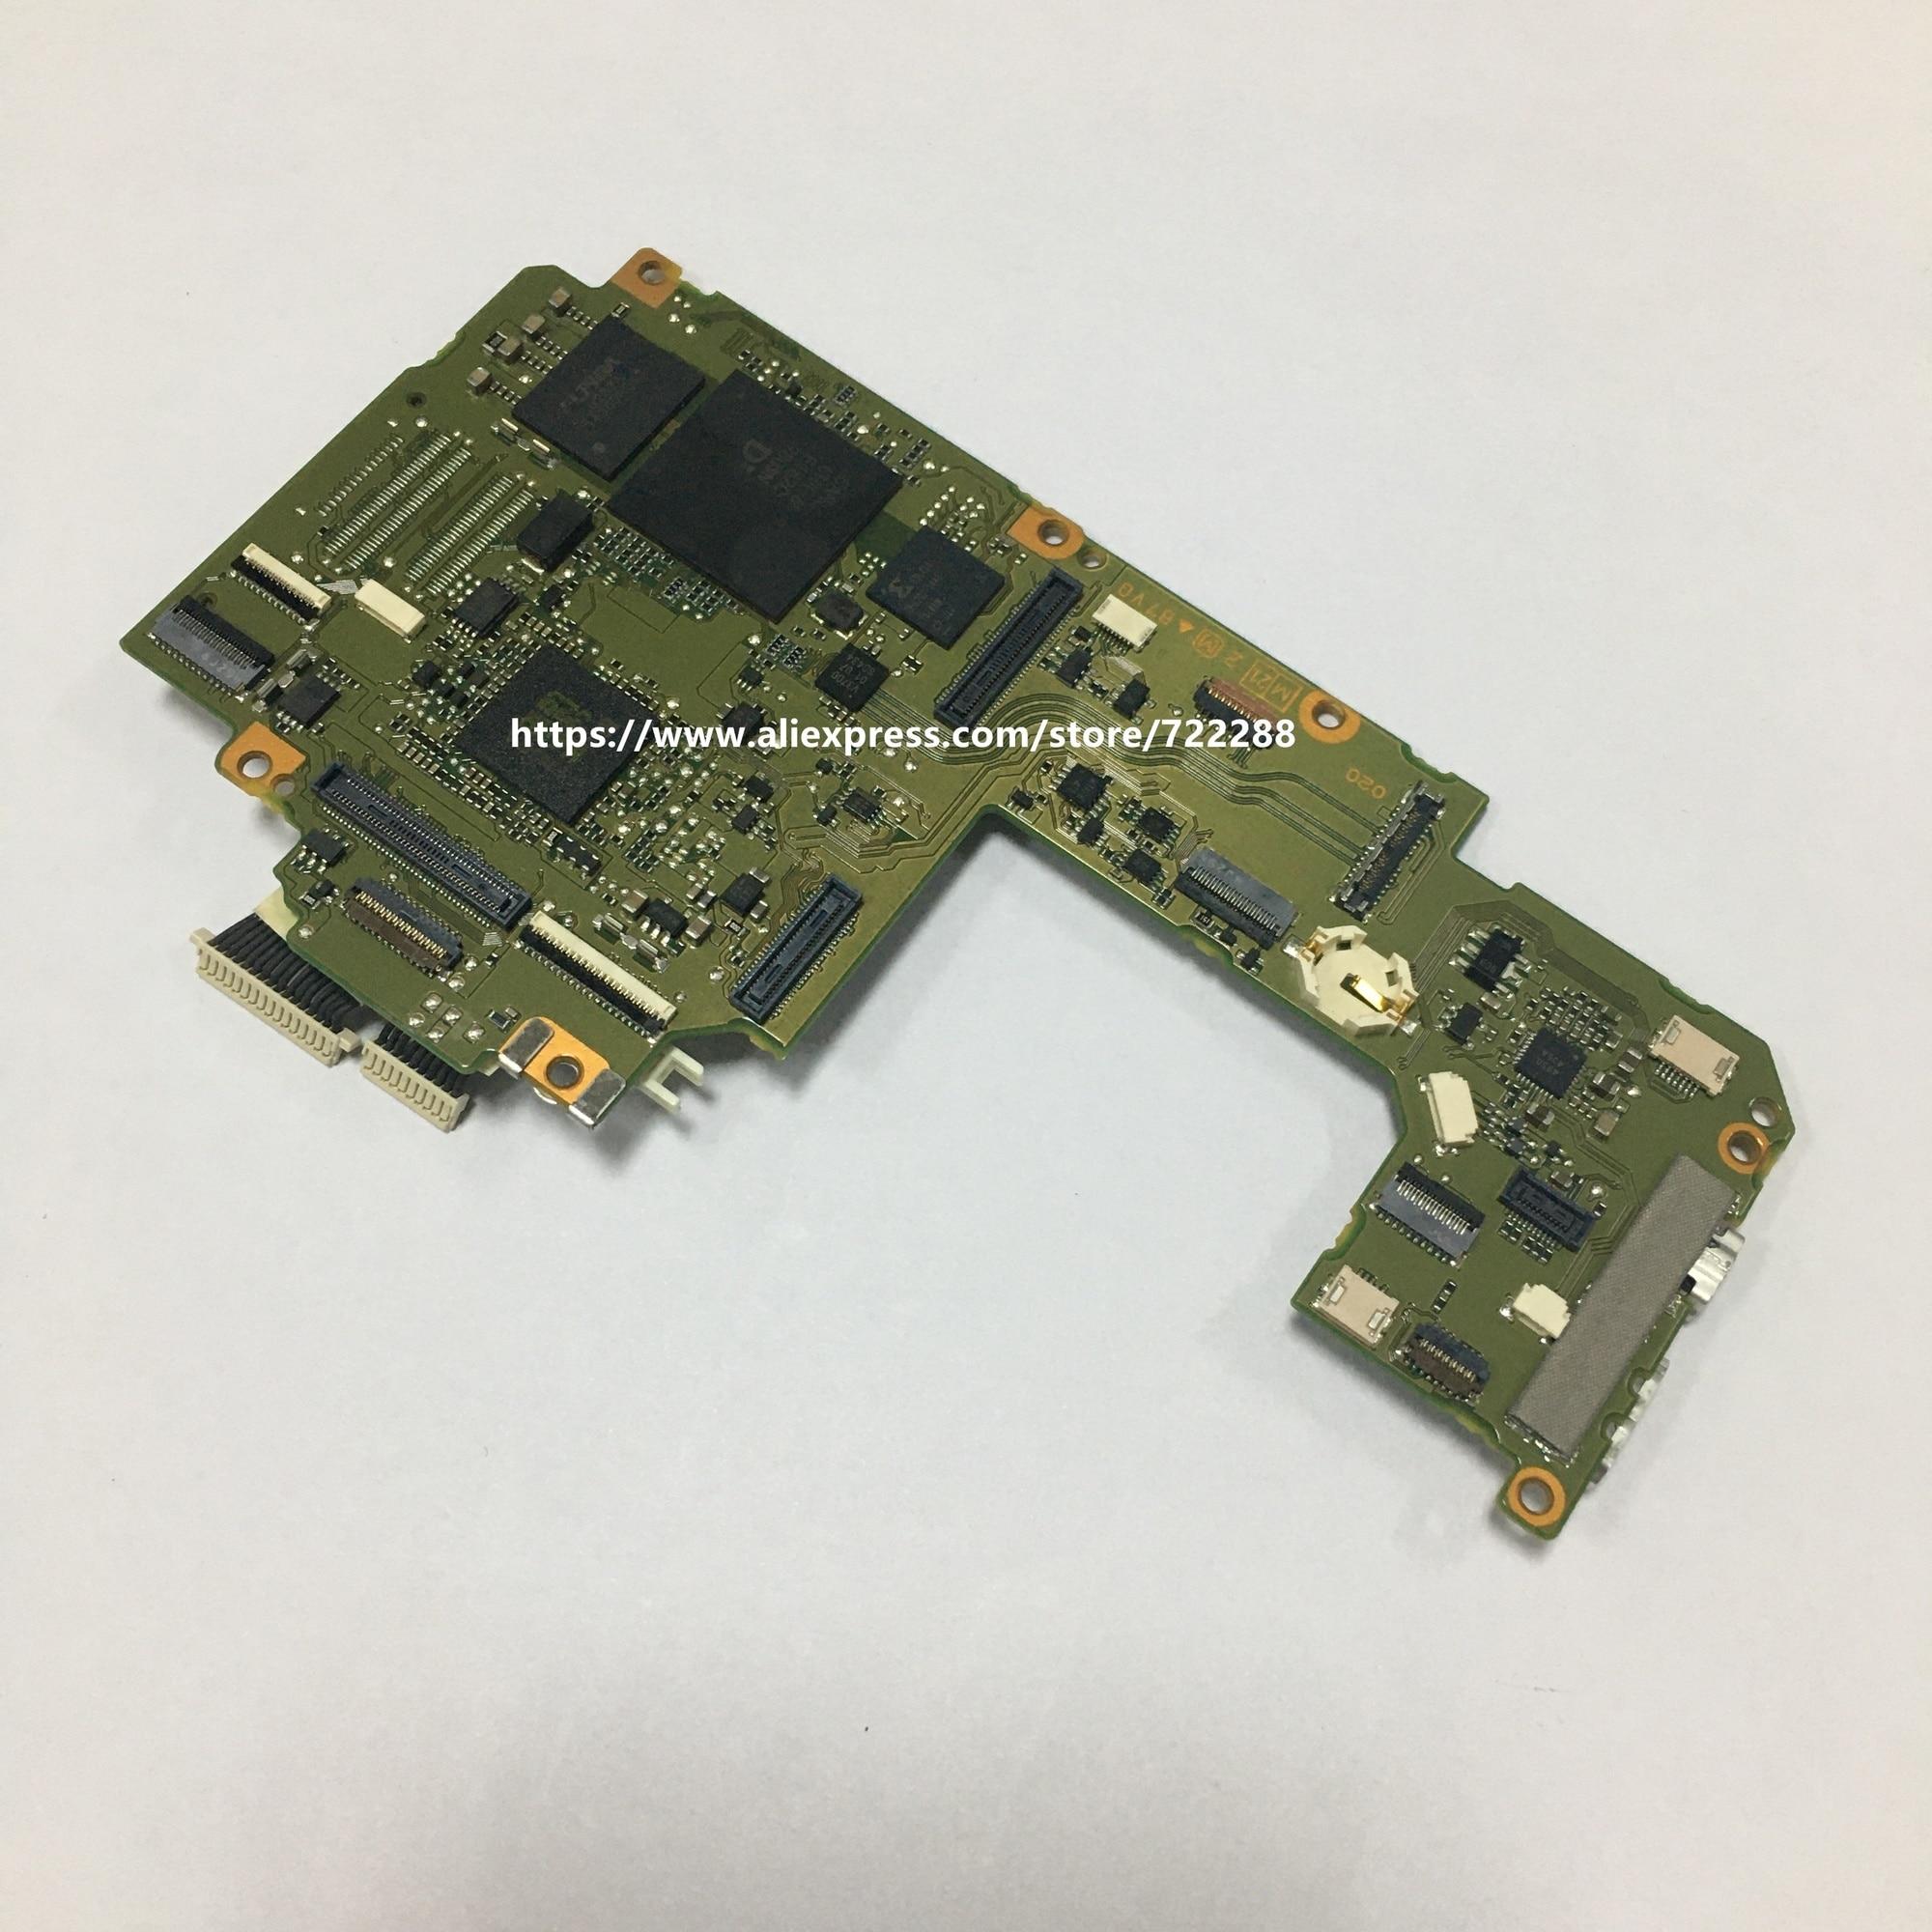 Repair Parts For Canon EOS 70D Main Board MCU Motherboard PCB Assy Card Slot New Original CG2-3390-000